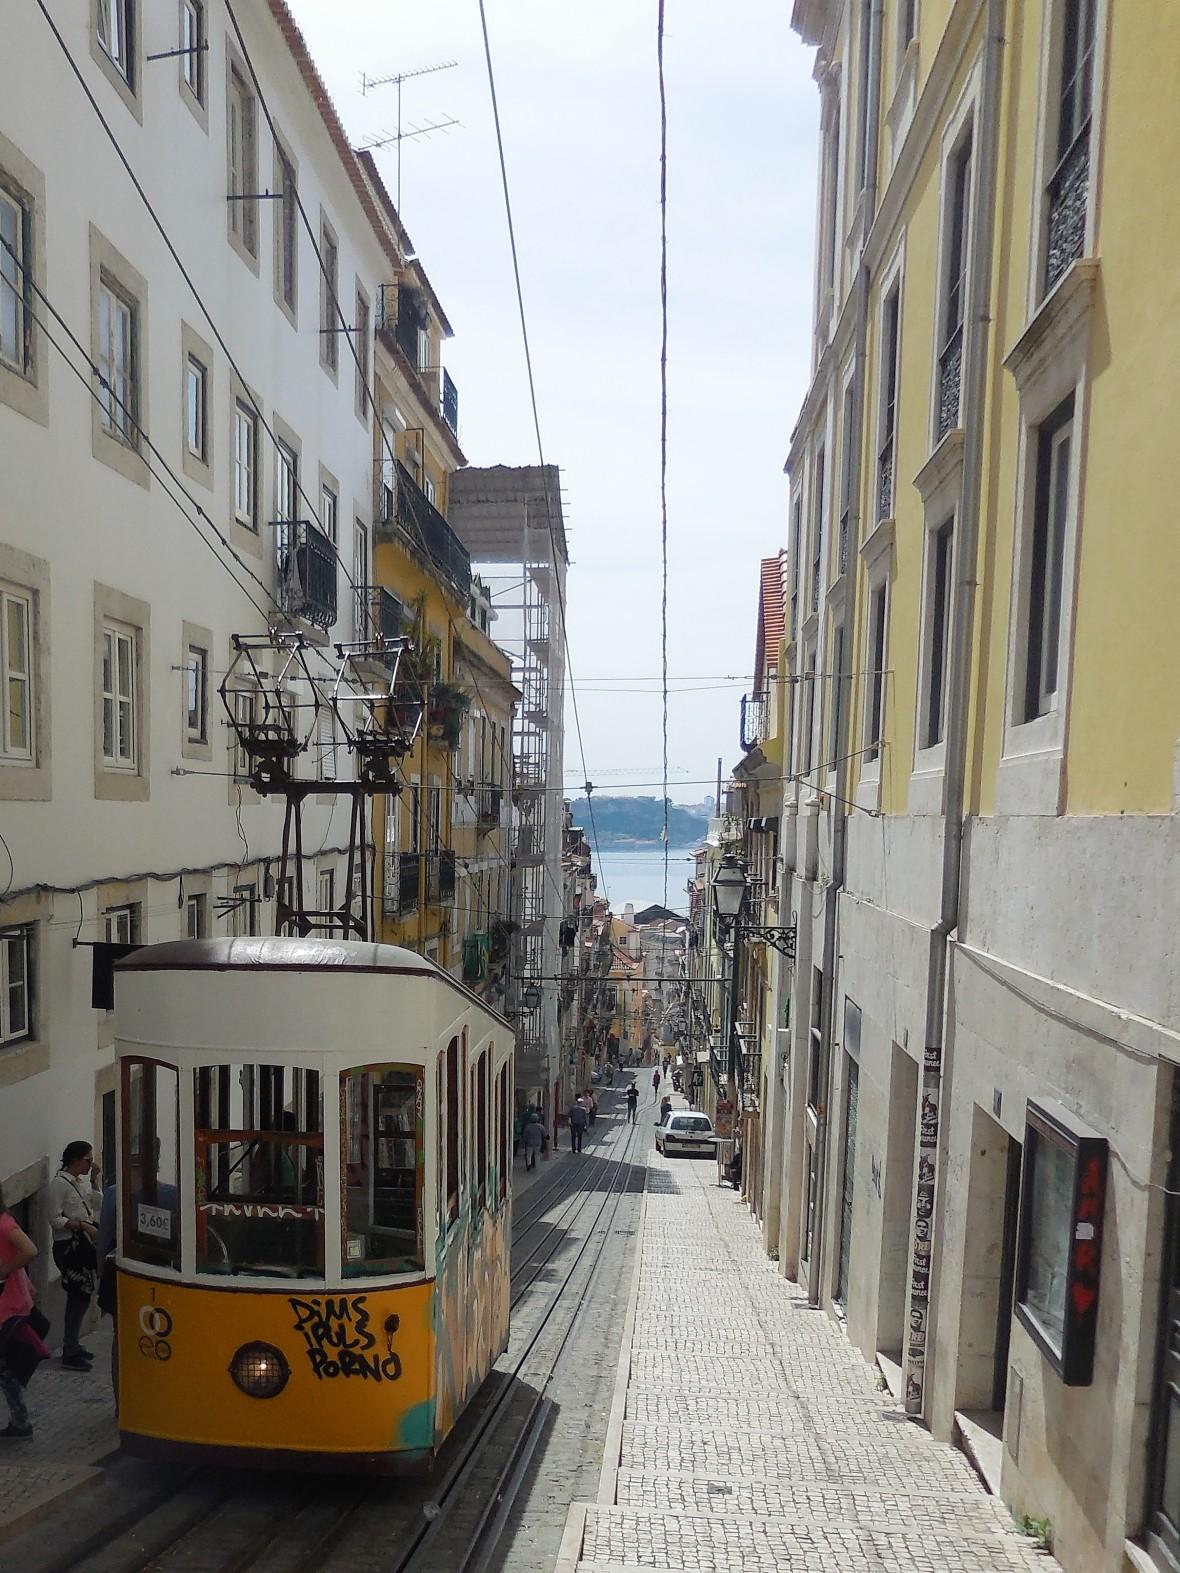 Portugal - Lisbonne  (1)